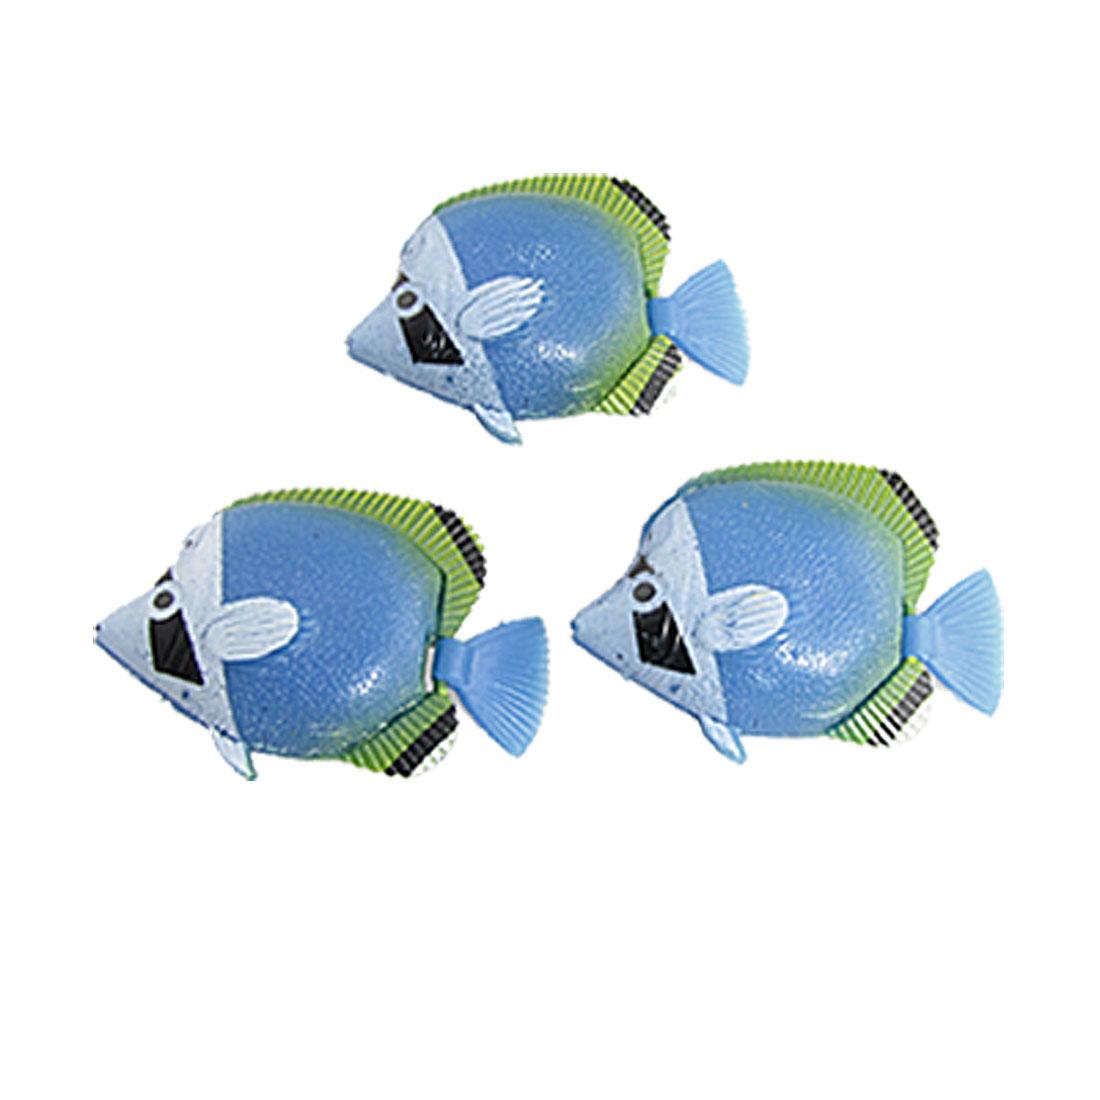 Blue Plastic Tropical Floating Tail Fish Aquarium Ornament 3PCS